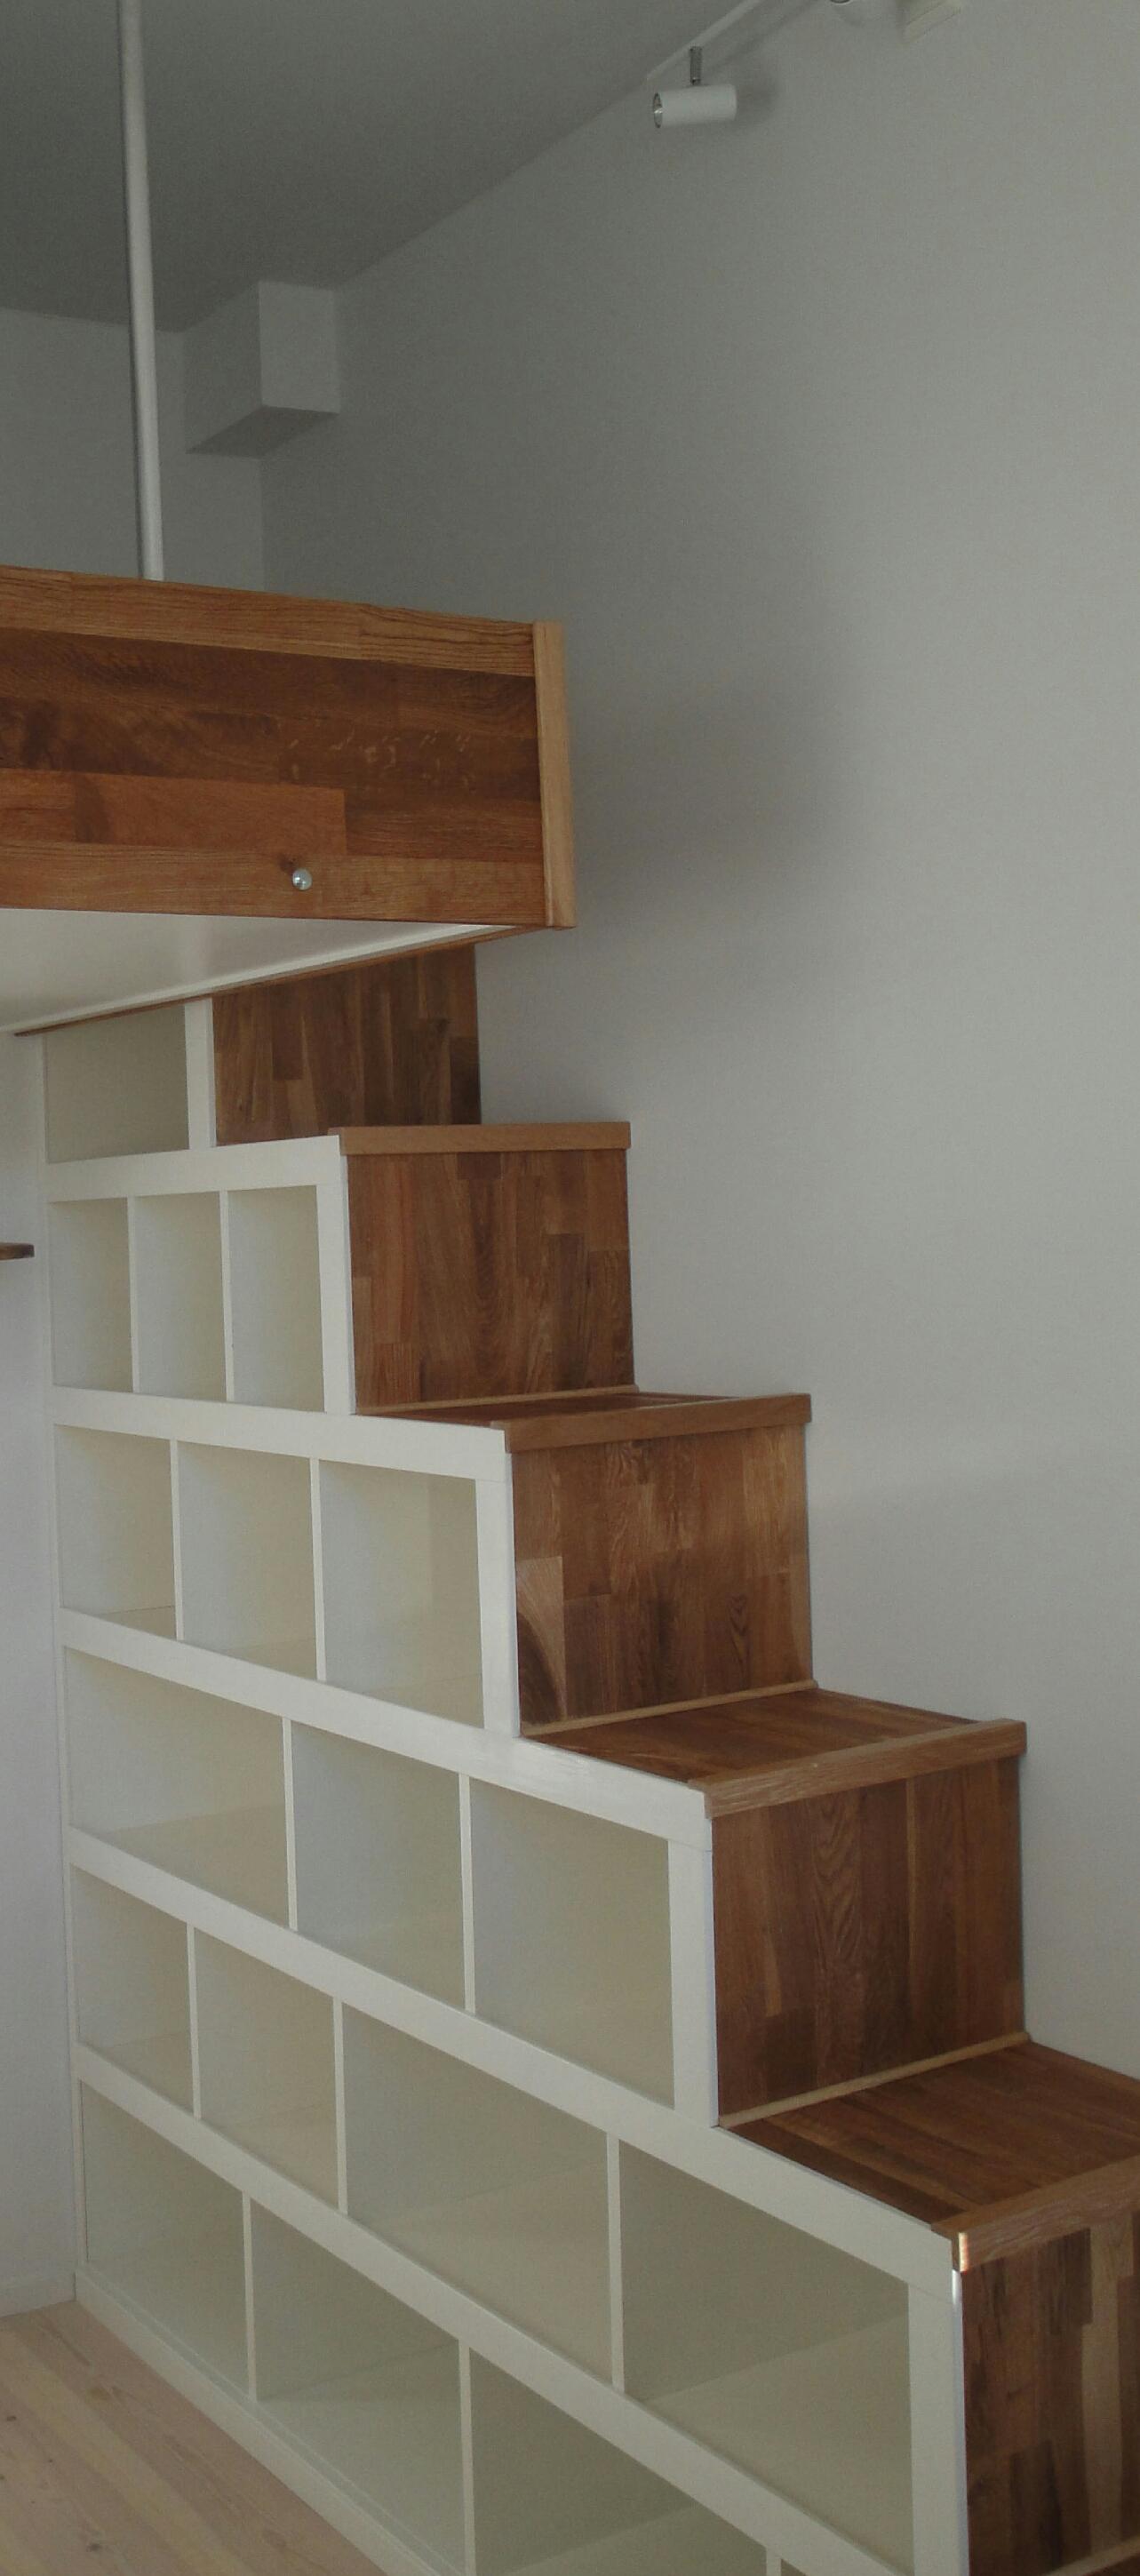 Trappa eller stege till loft CamillaBergquist Blog